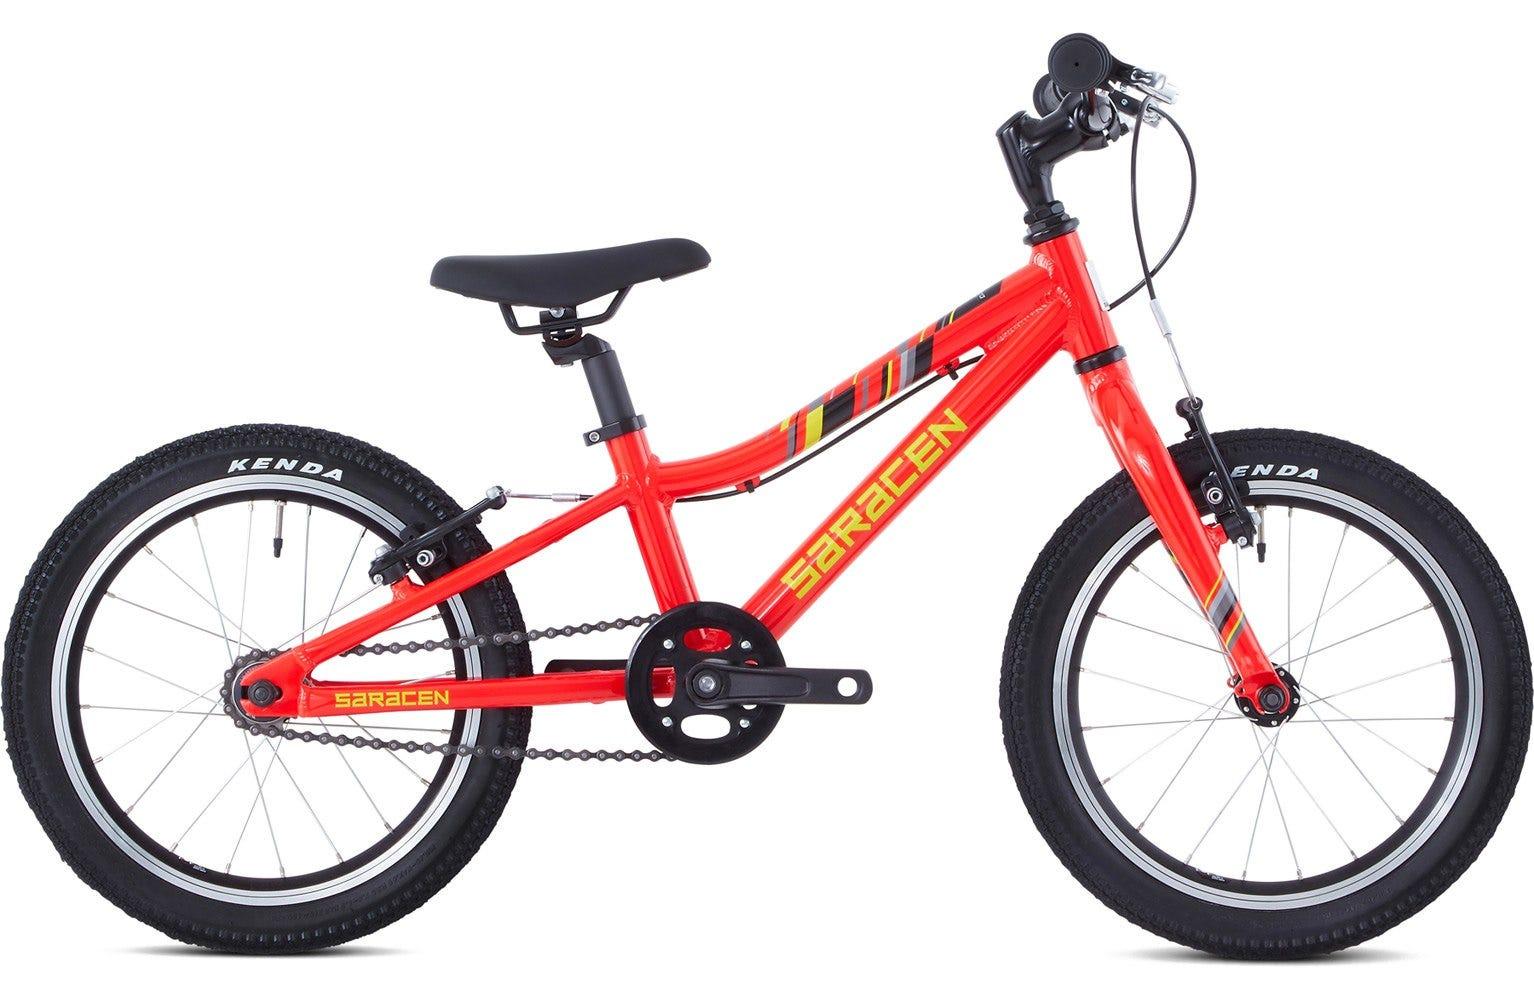 Saracen Mantra 16 inch Boys bike sample (unused)